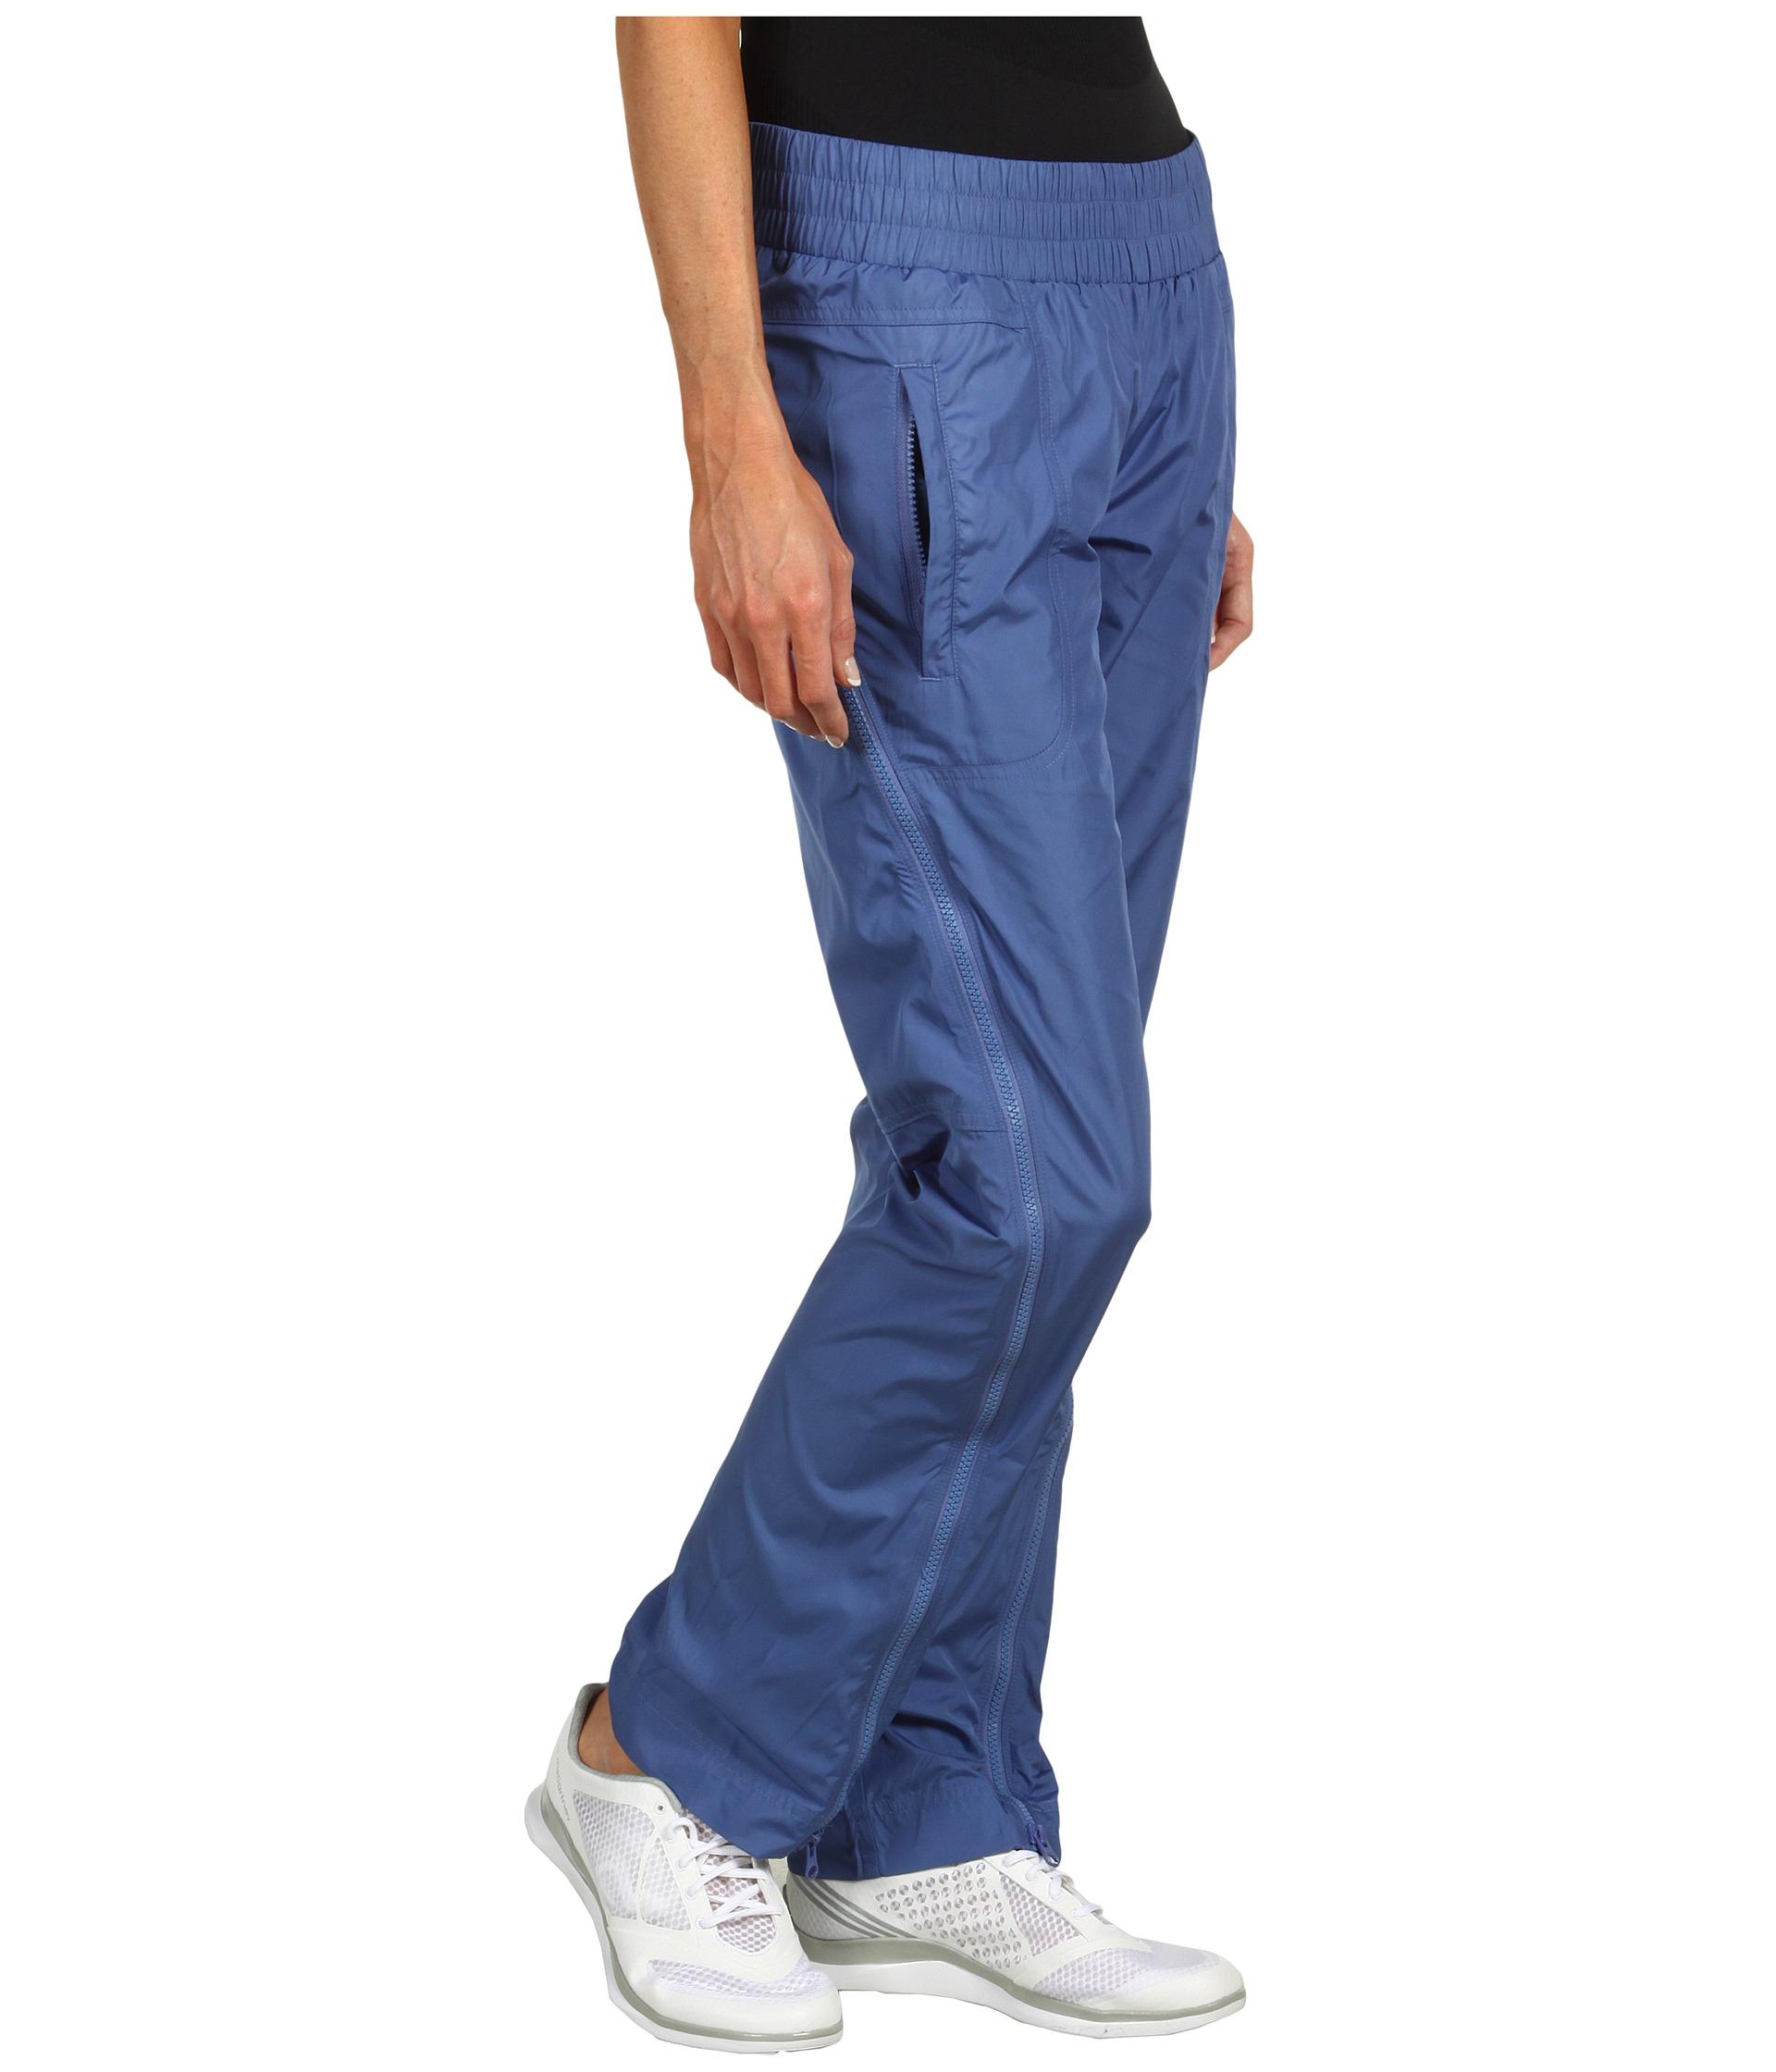 Adidas Stella McCartney Studio Woven Pants in Baby Blue Profile View